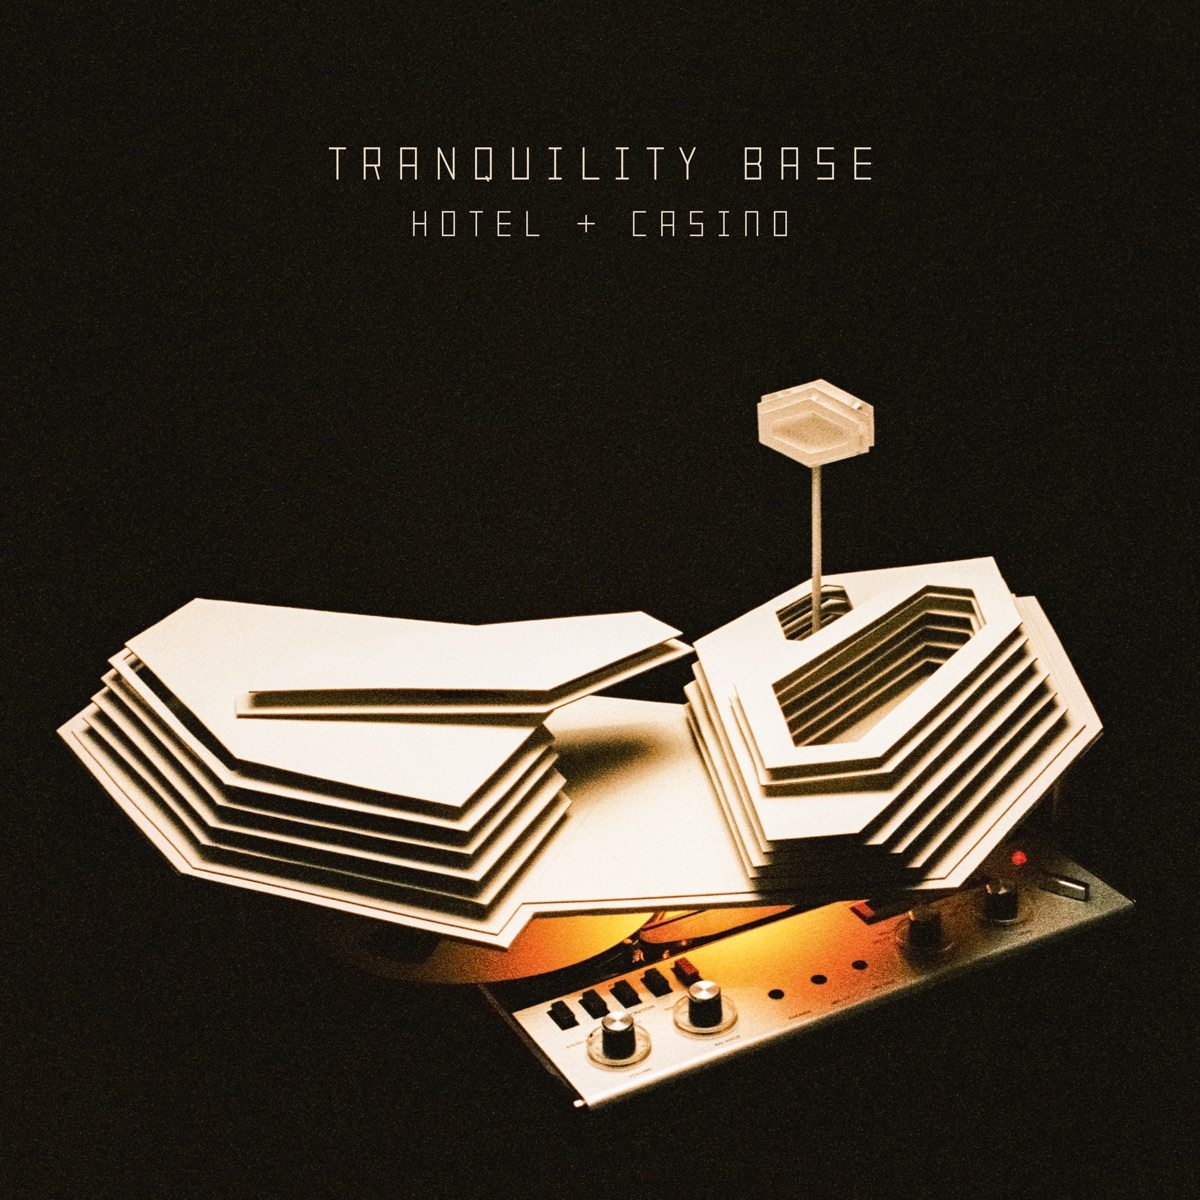 Tranquility Base Hotel  Casino Arctic Monkeys CD cover